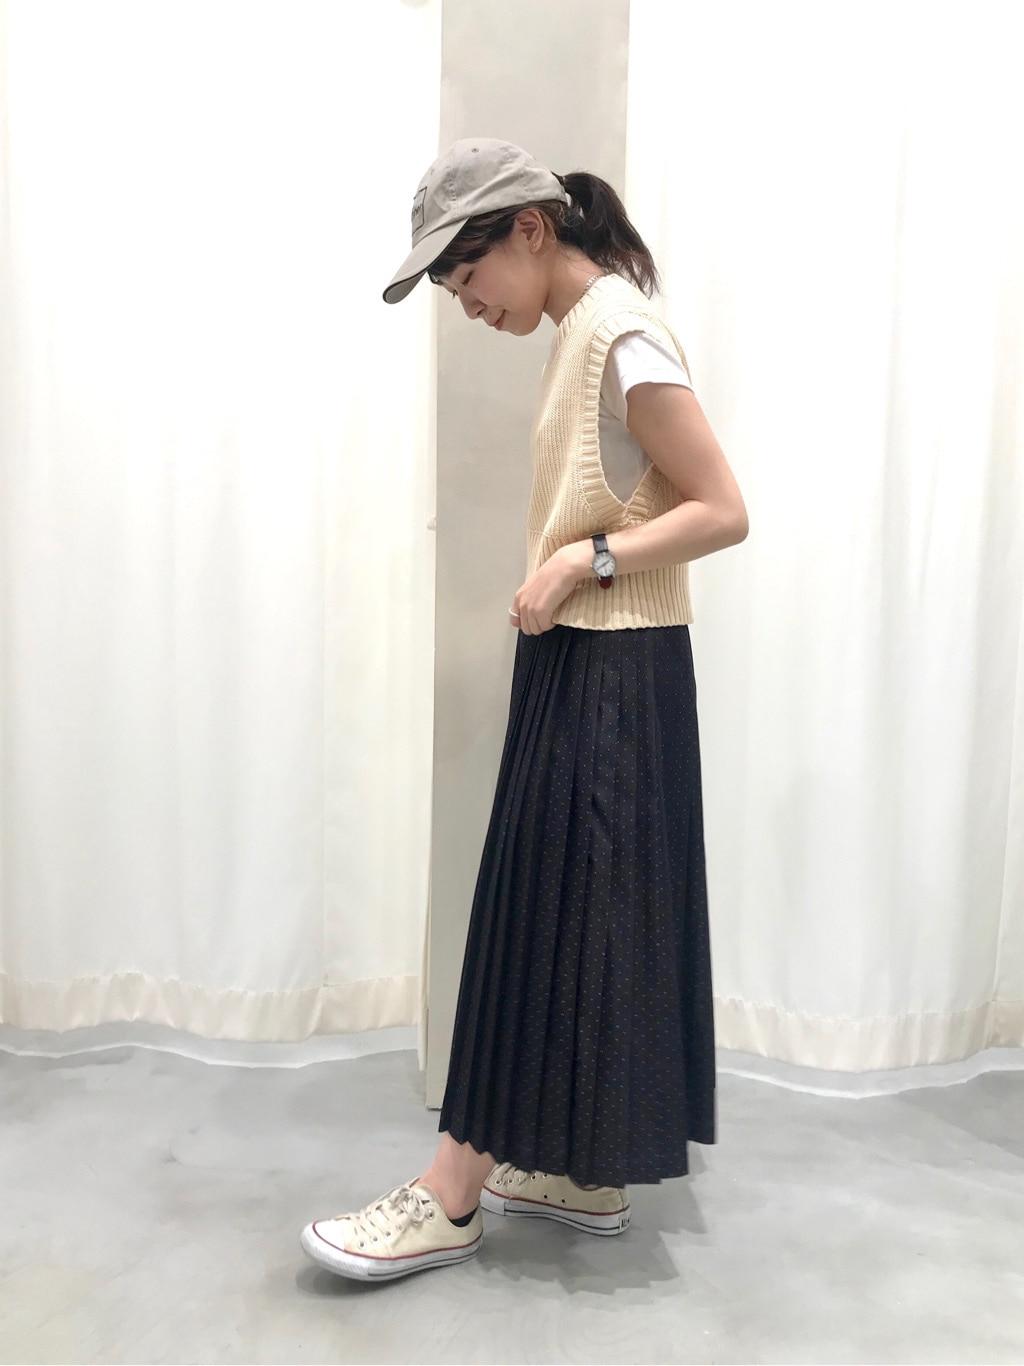 - PAR ICI CHILD WOMAN , PAR ICI 東京スカイツリータウン・ソラマチ 身長:154cm 2020.08.05